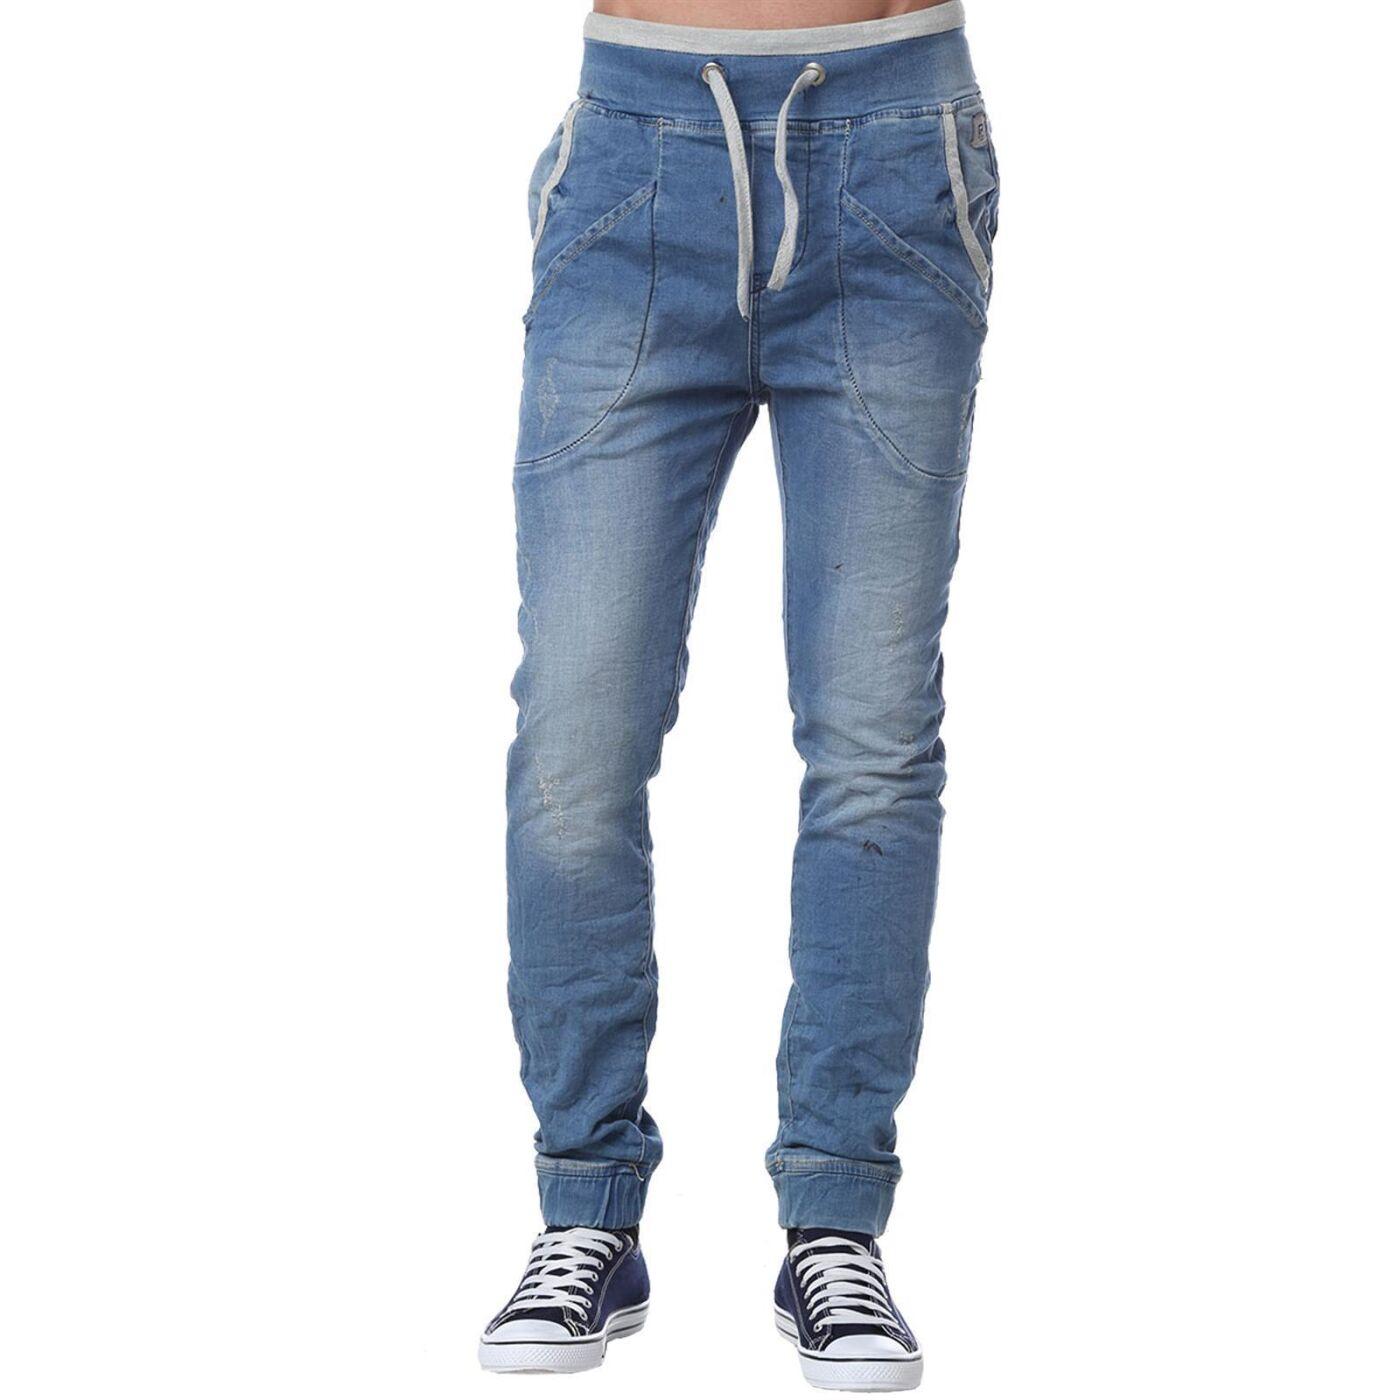 red bridge herren jogg denim jeans hose mit gummizug blau. Black Bedroom Furniture Sets. Home Design Ideas